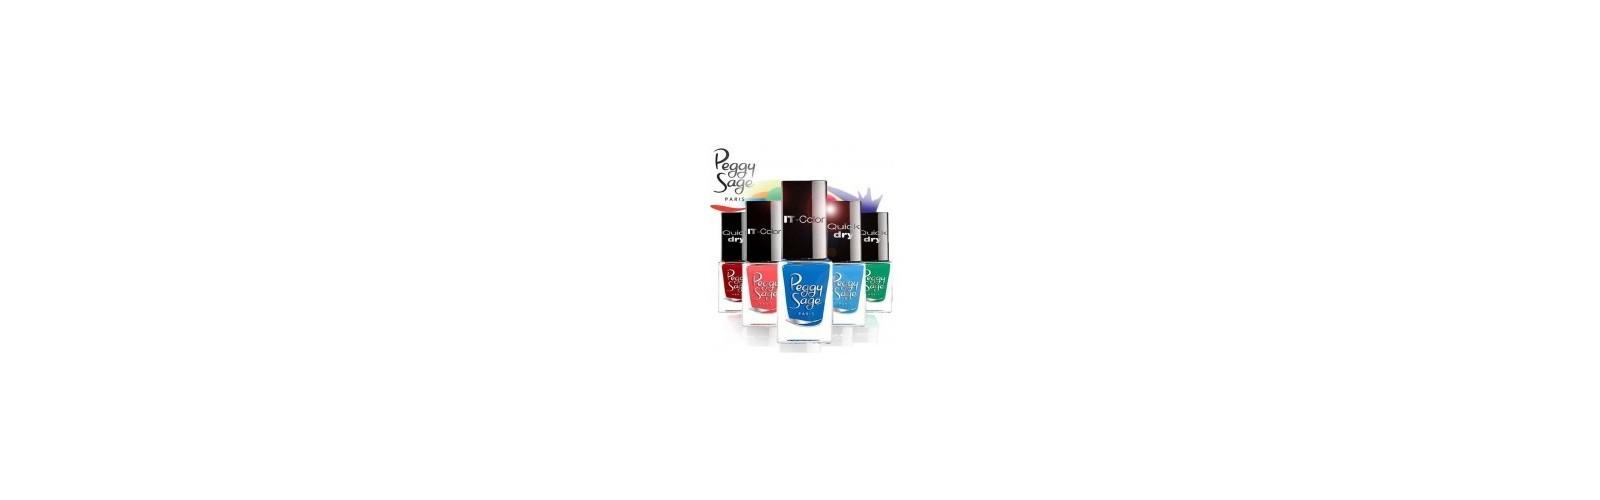 Mini nail polish Peggy Sage